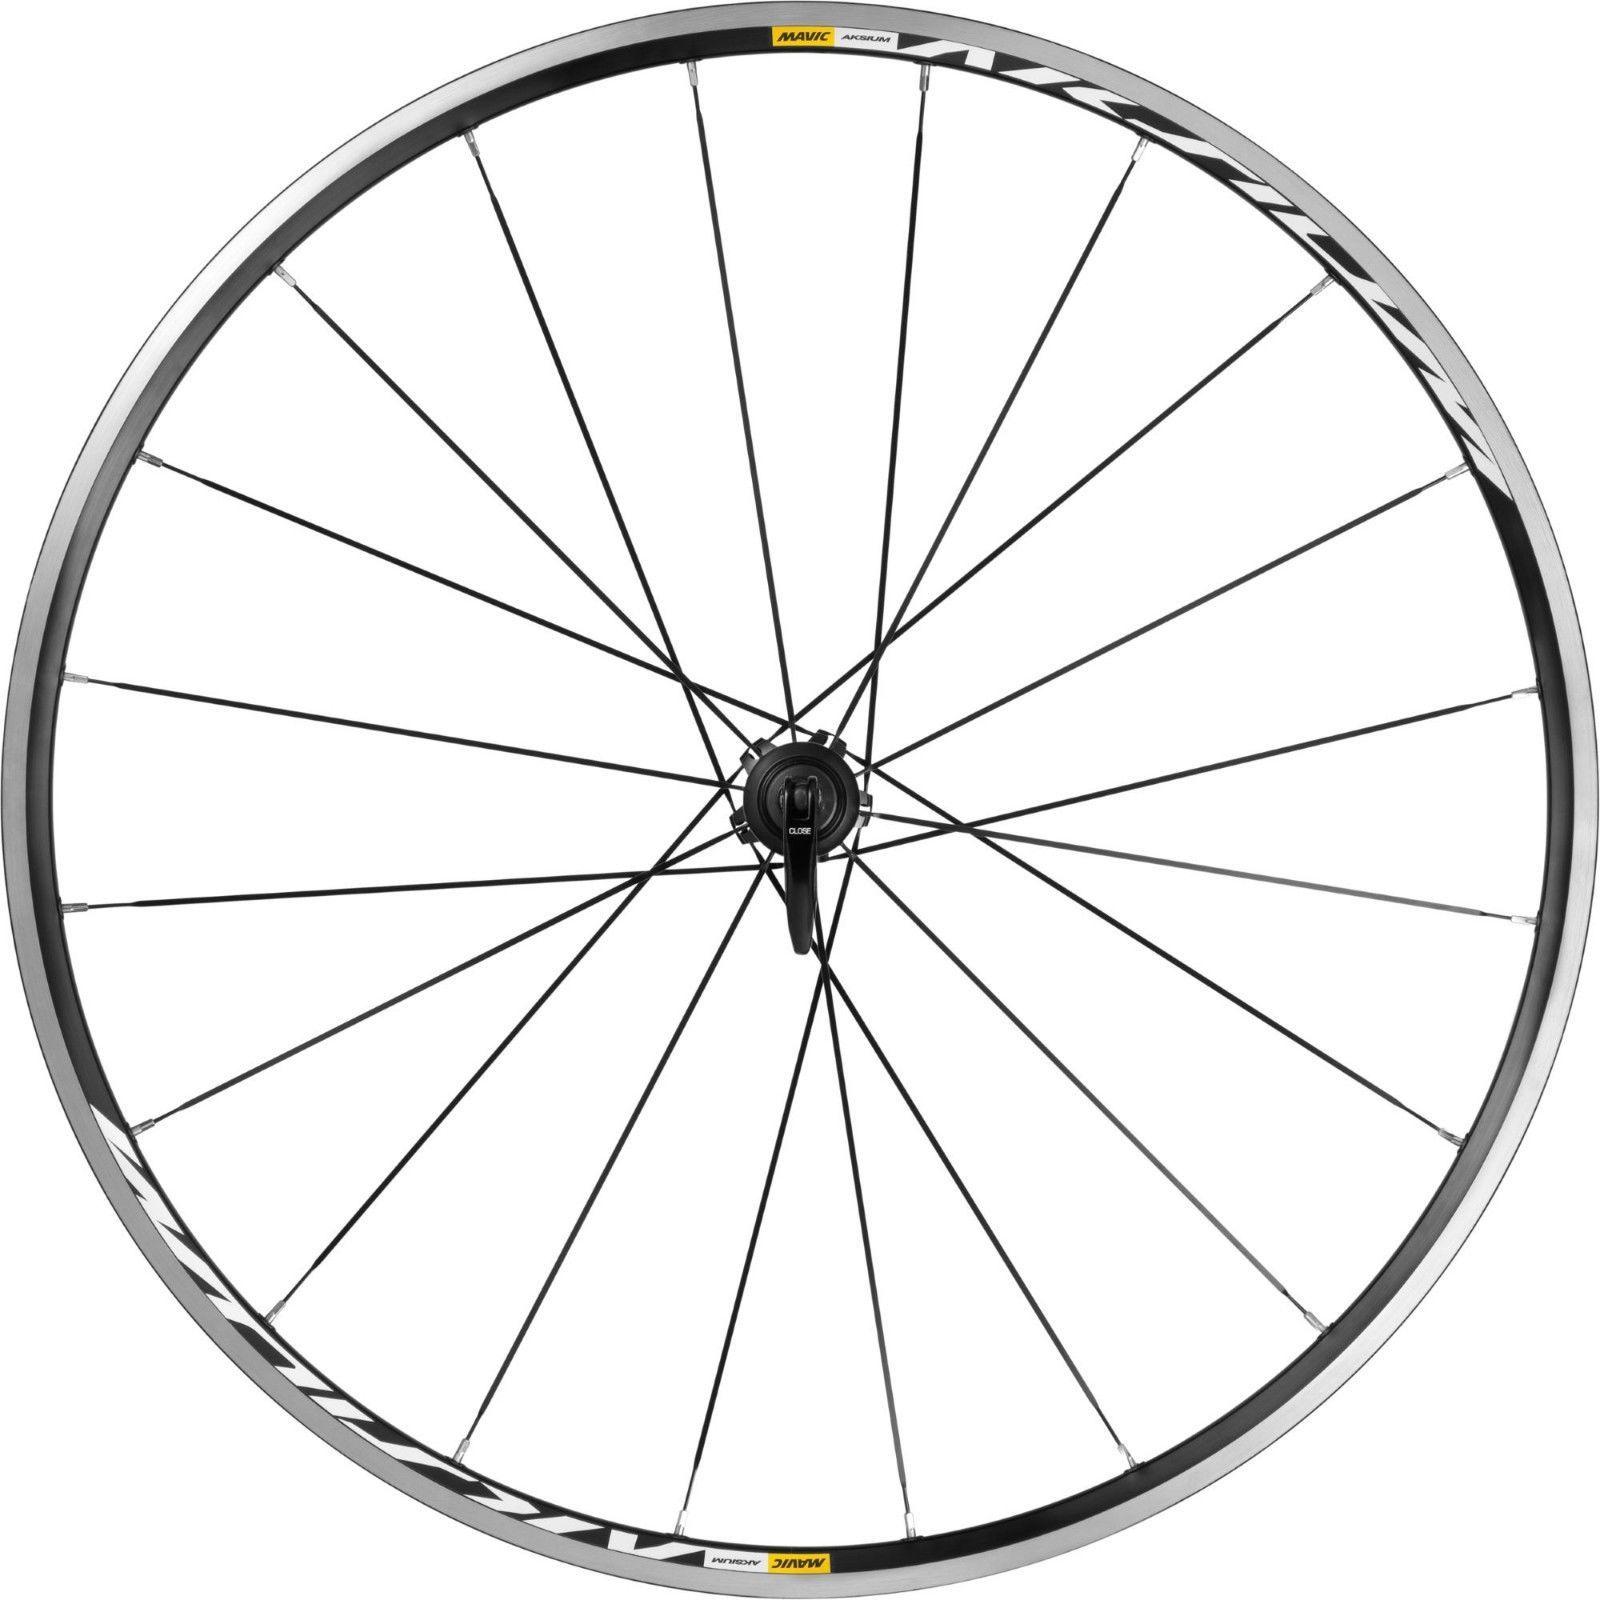 Mavic Aksium Rear Wheel For Road Or Triathlon Bike